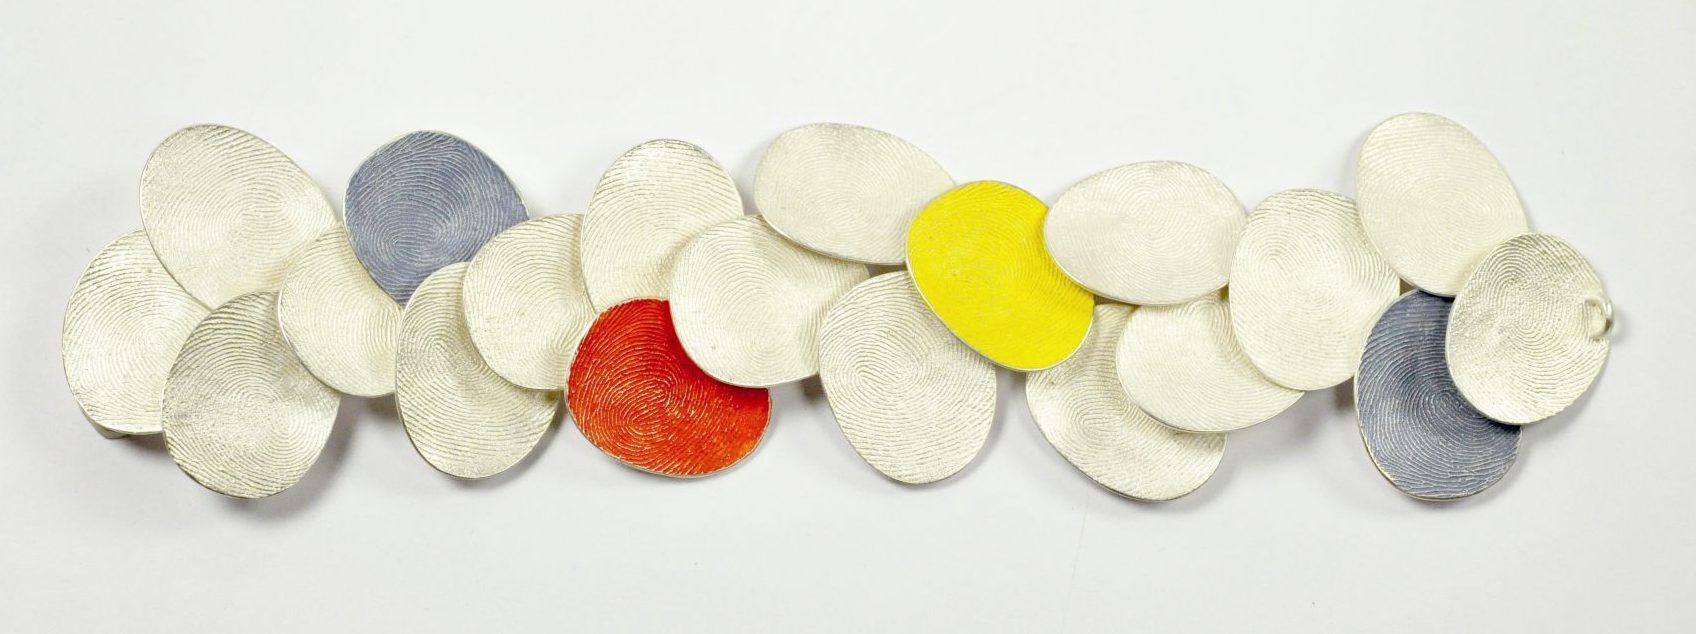 Gerd Rothmann, Baedeker im Schmuck, armband, 2021, zilver, pigment